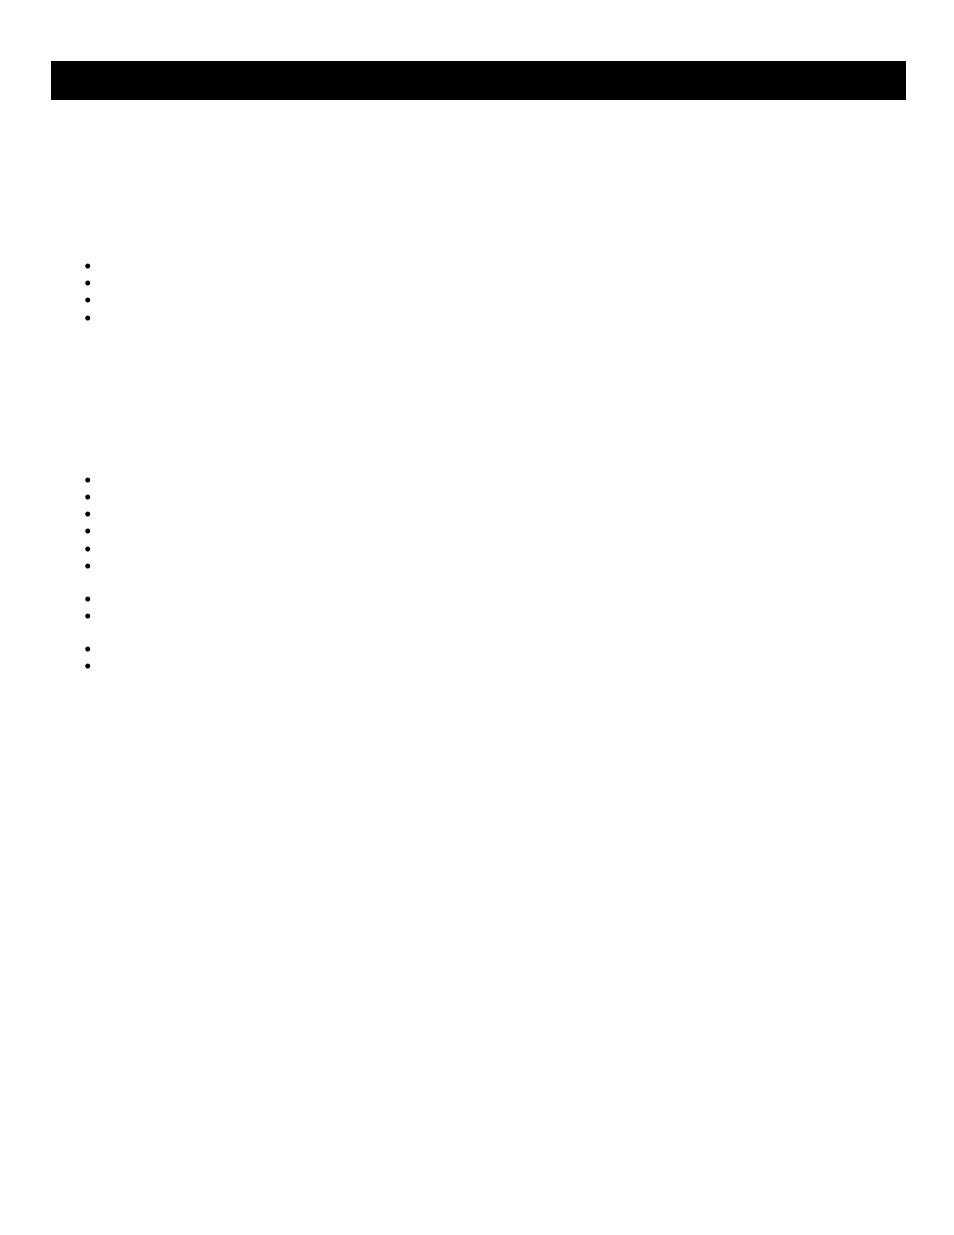 Star trac recumbent bike service manual.